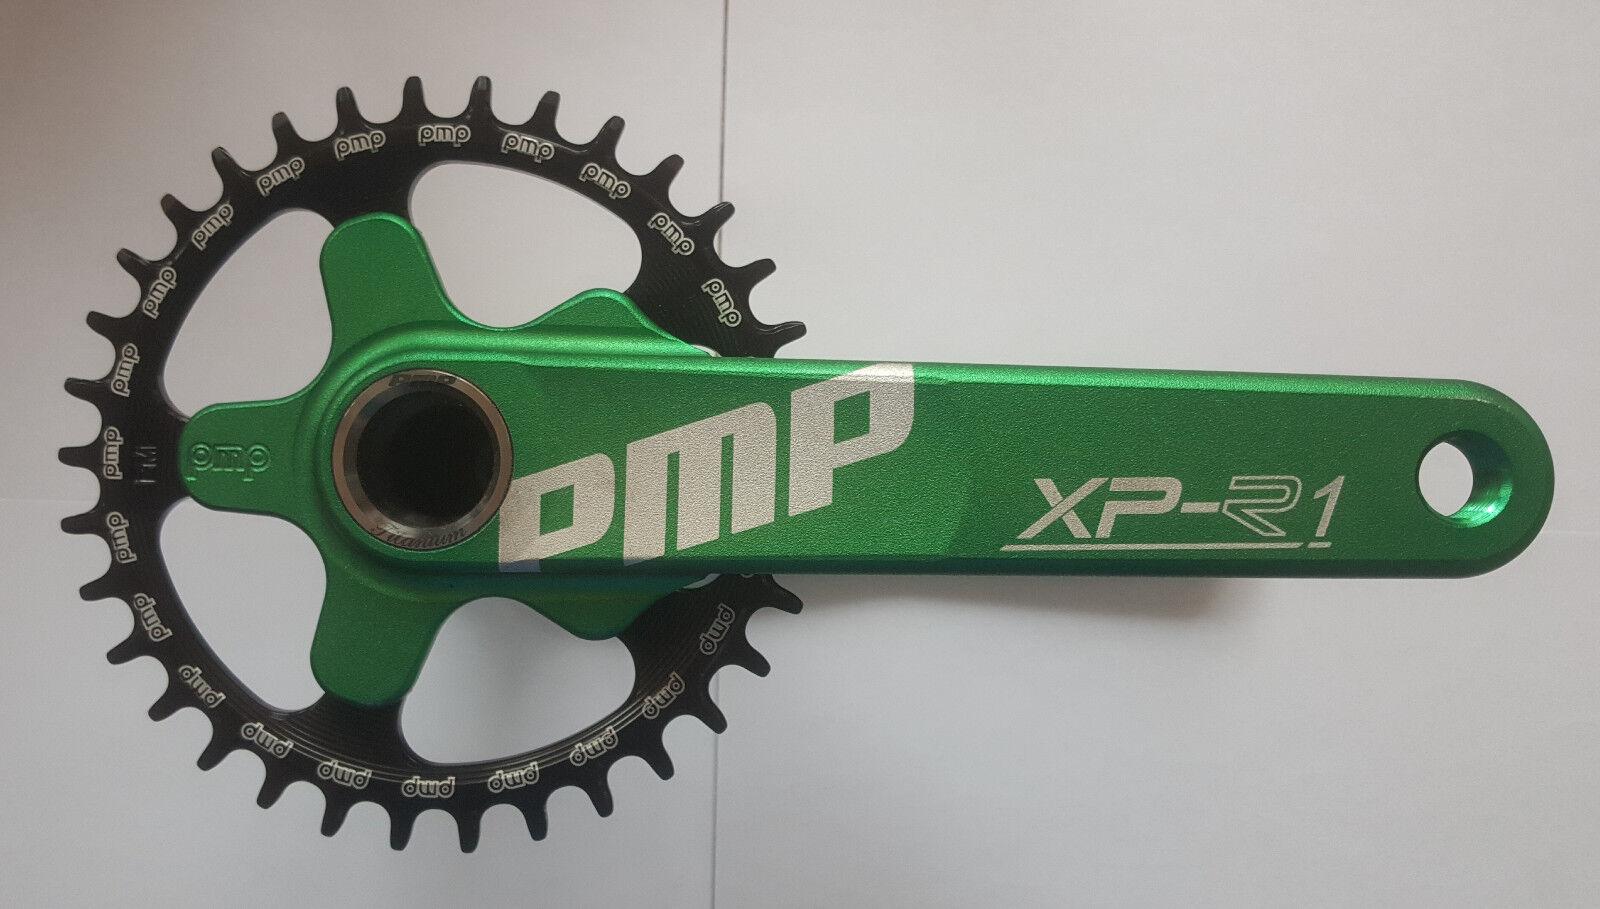 New PMP  XP-R1  Crankset MTB  172.5 mm. Made in Italia